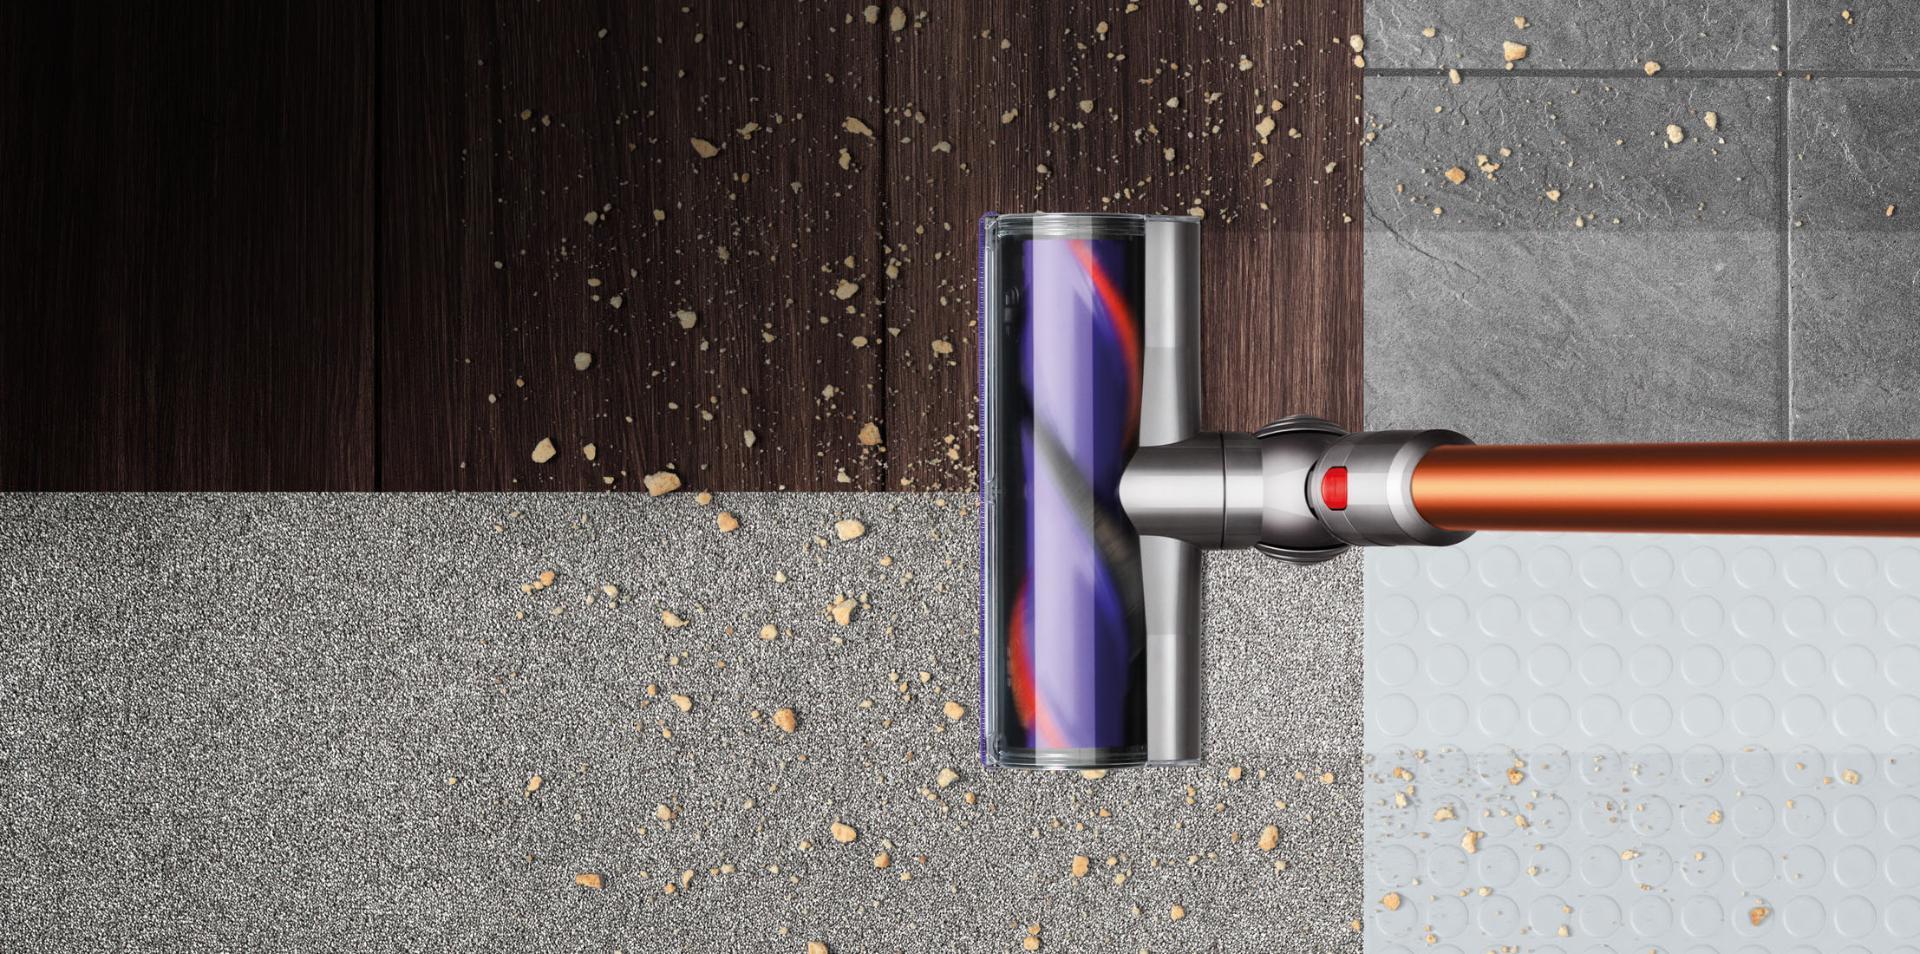 Dyson Cyclone V10™ elektrikli süpürge dört döşeme tipini temizlerken